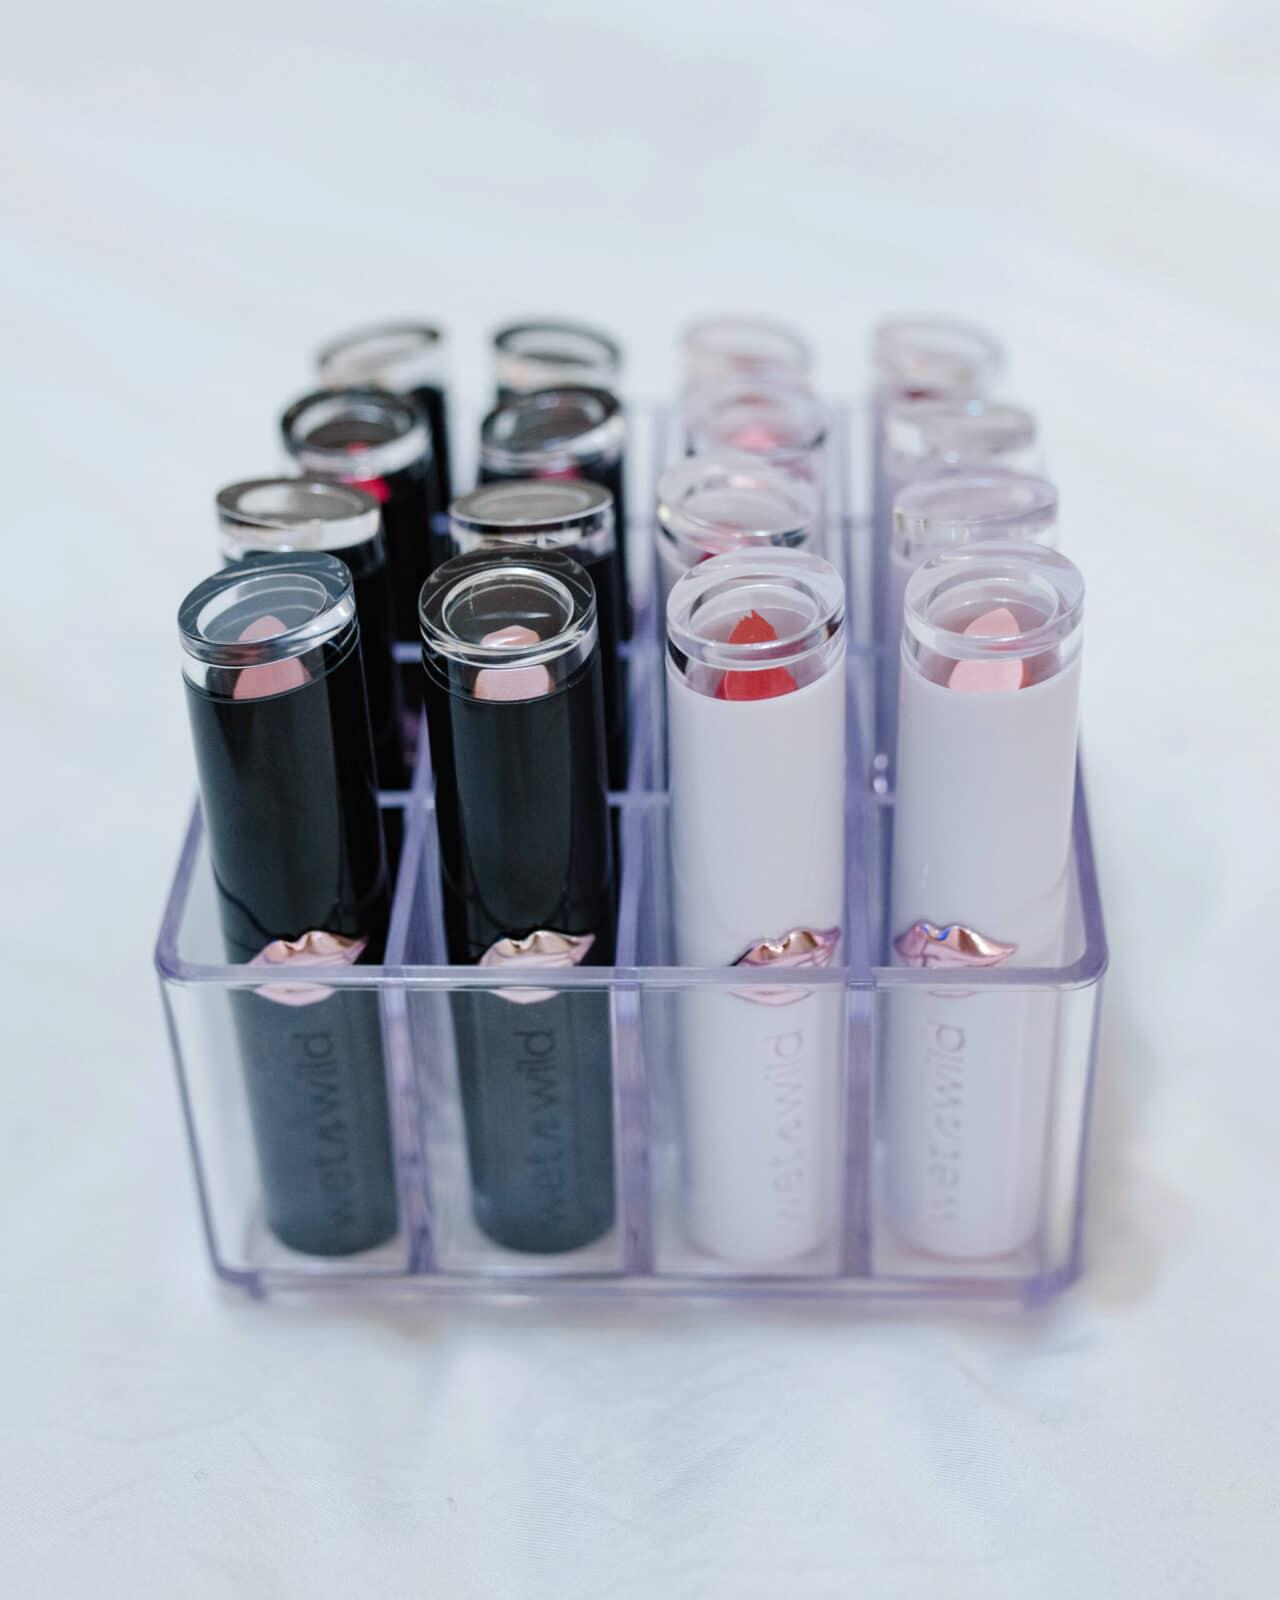 Mega Last Lip Colors. The MEGA LAST HIGH-SHINE LIP COLOR